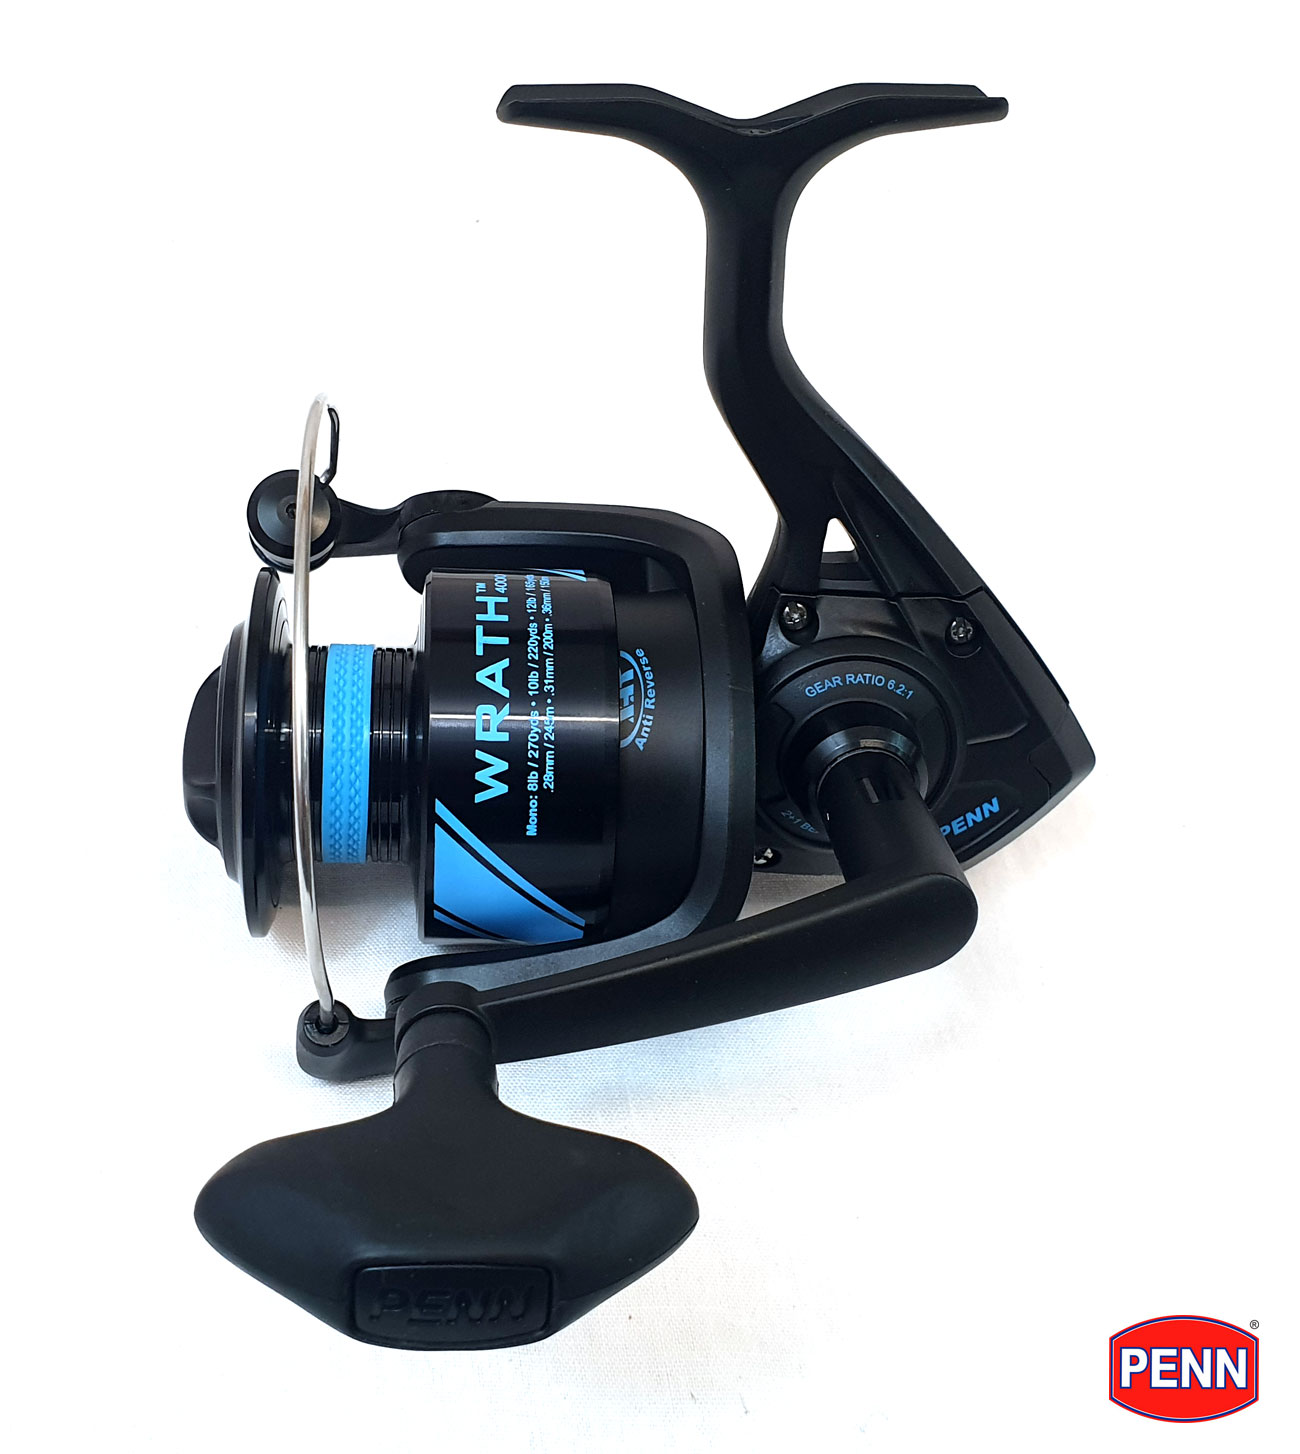 New PENN Wrath 'Fixed Spool' Spinning Fishing Reel - All ...